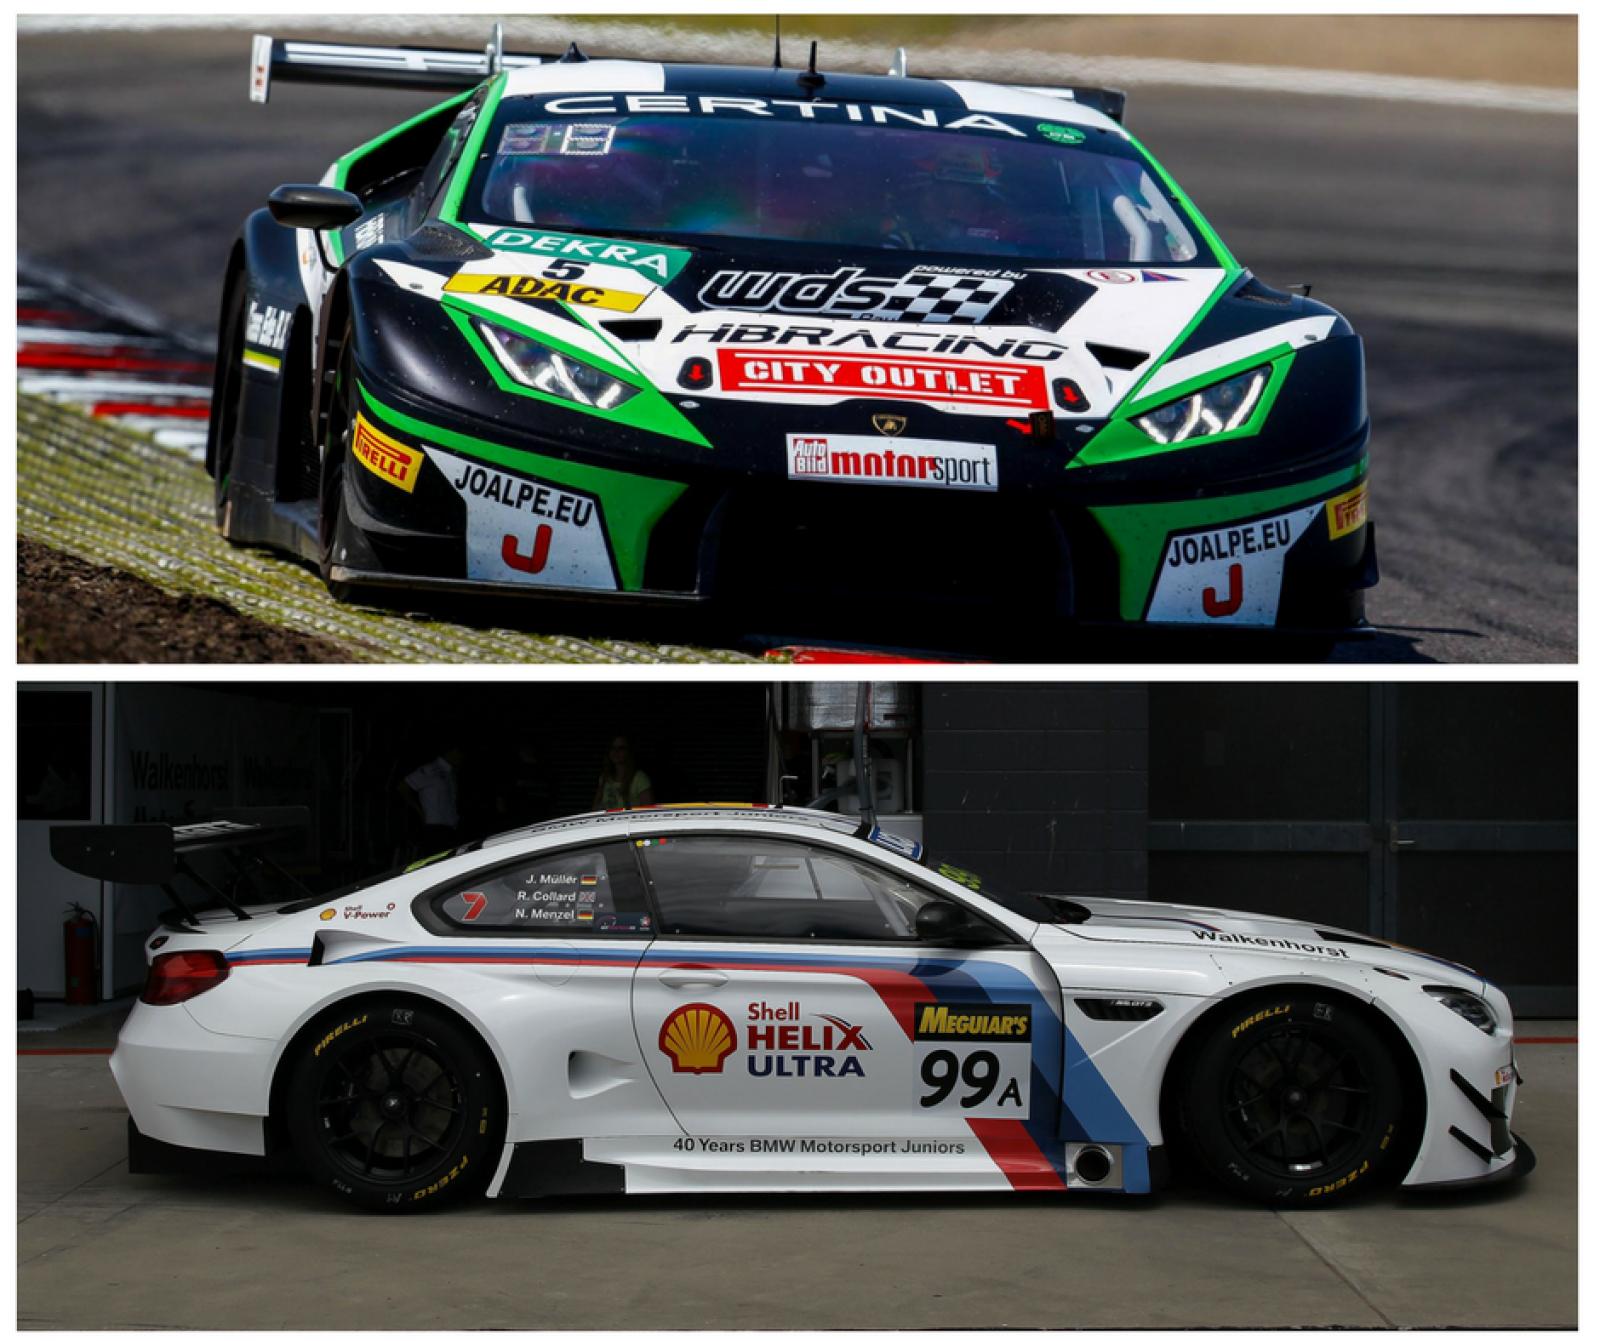 New teams strengthen Blancpain GT Series Endurance Cup